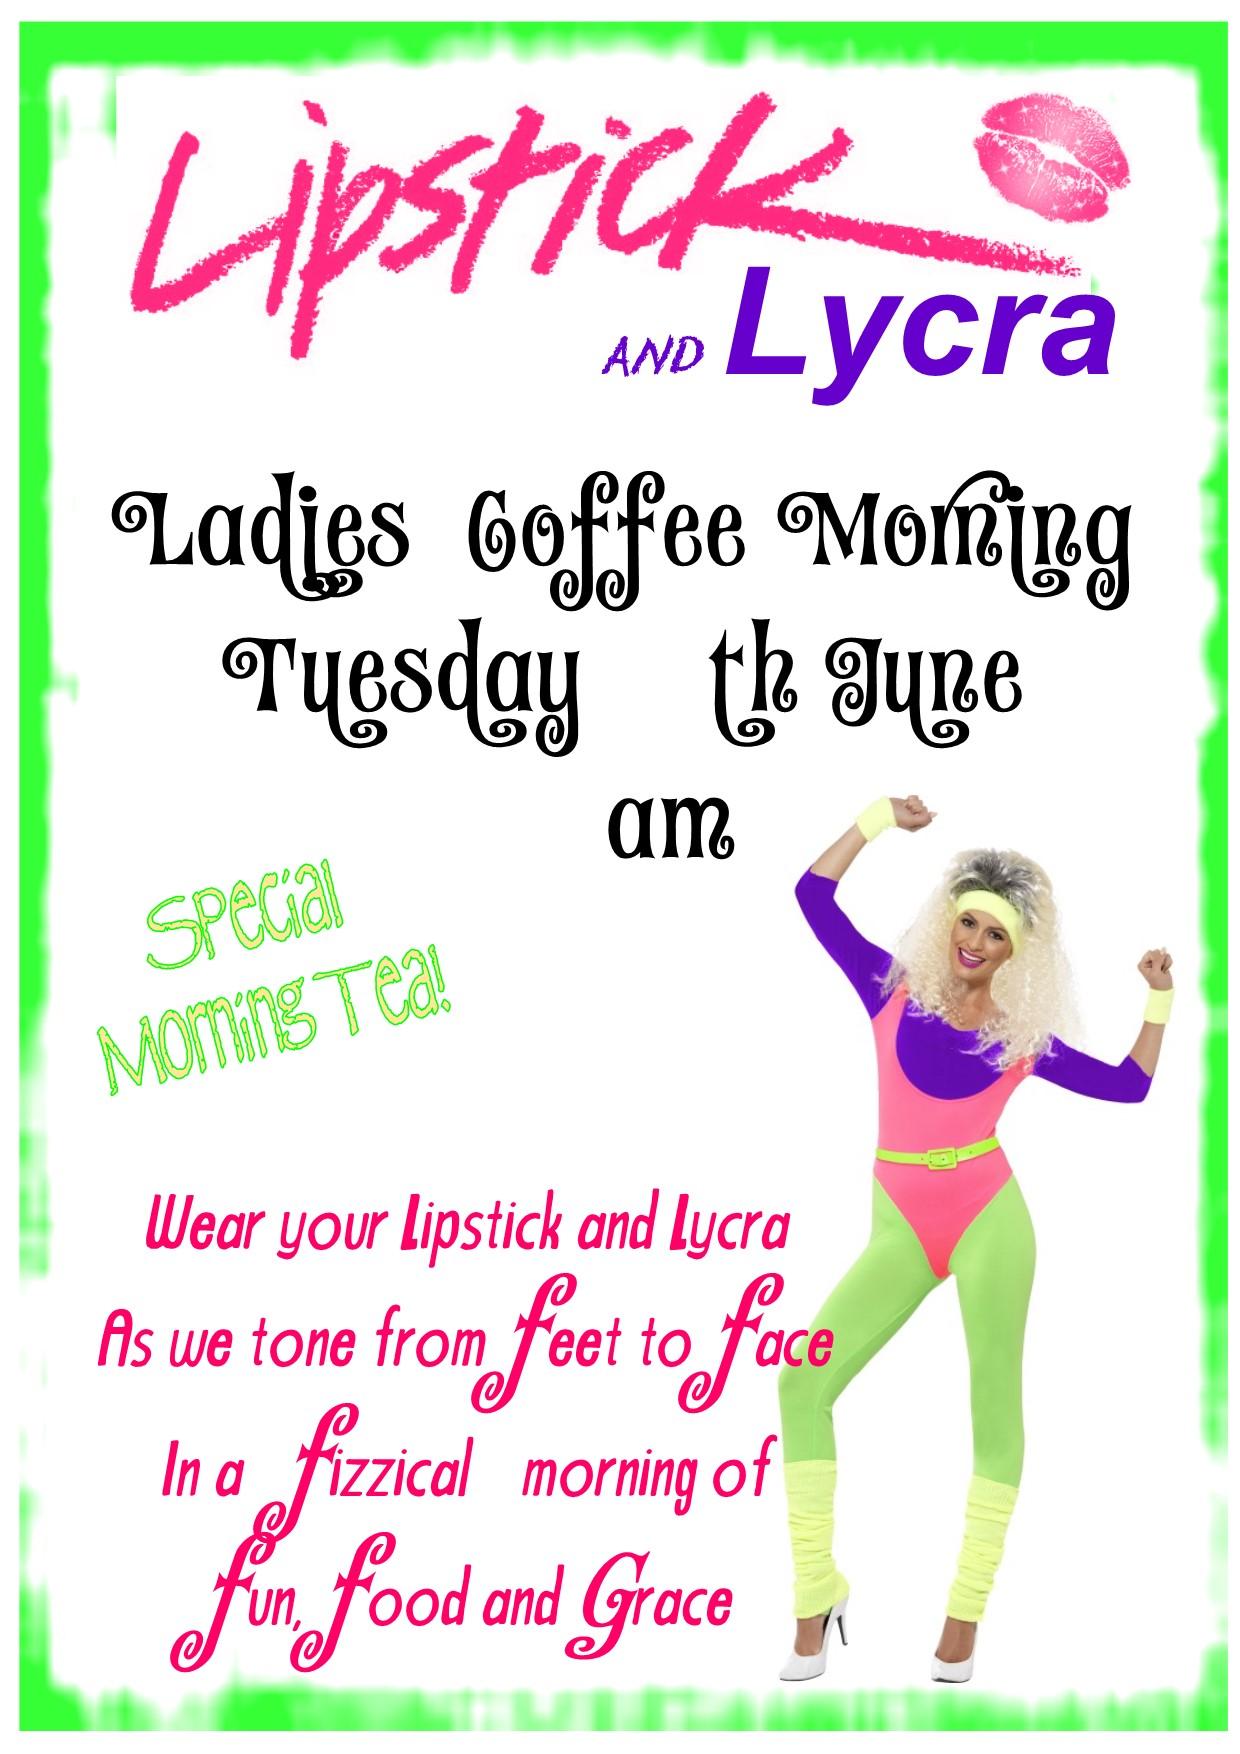 Coffee Morning - Lipstick and Lycra.jpg